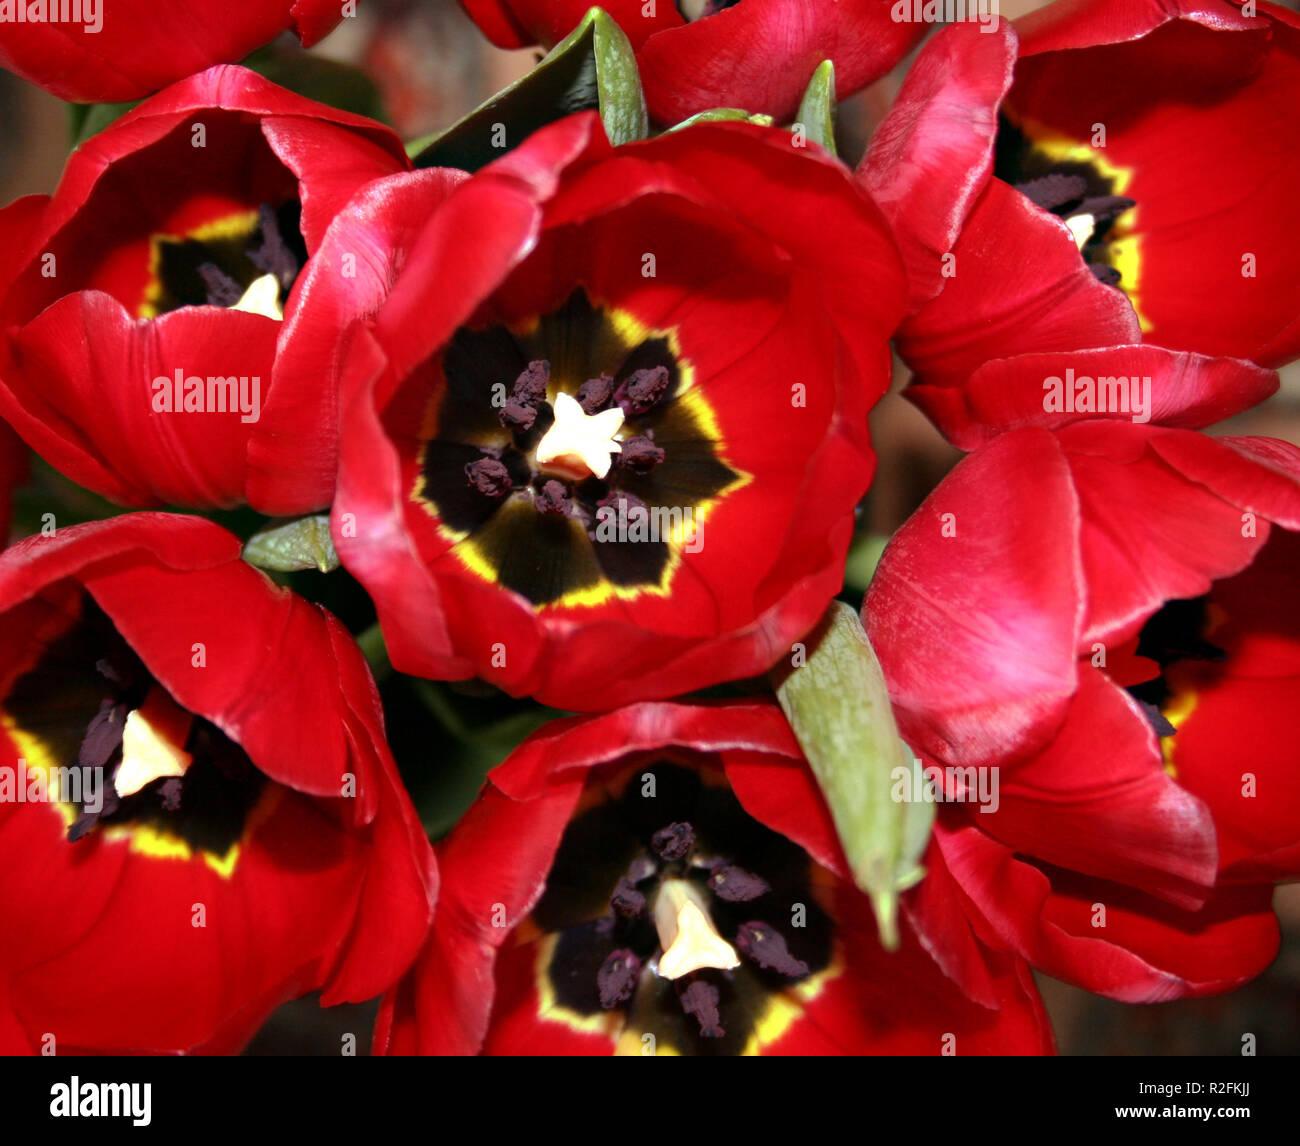 sags through the tulip Stock Photo